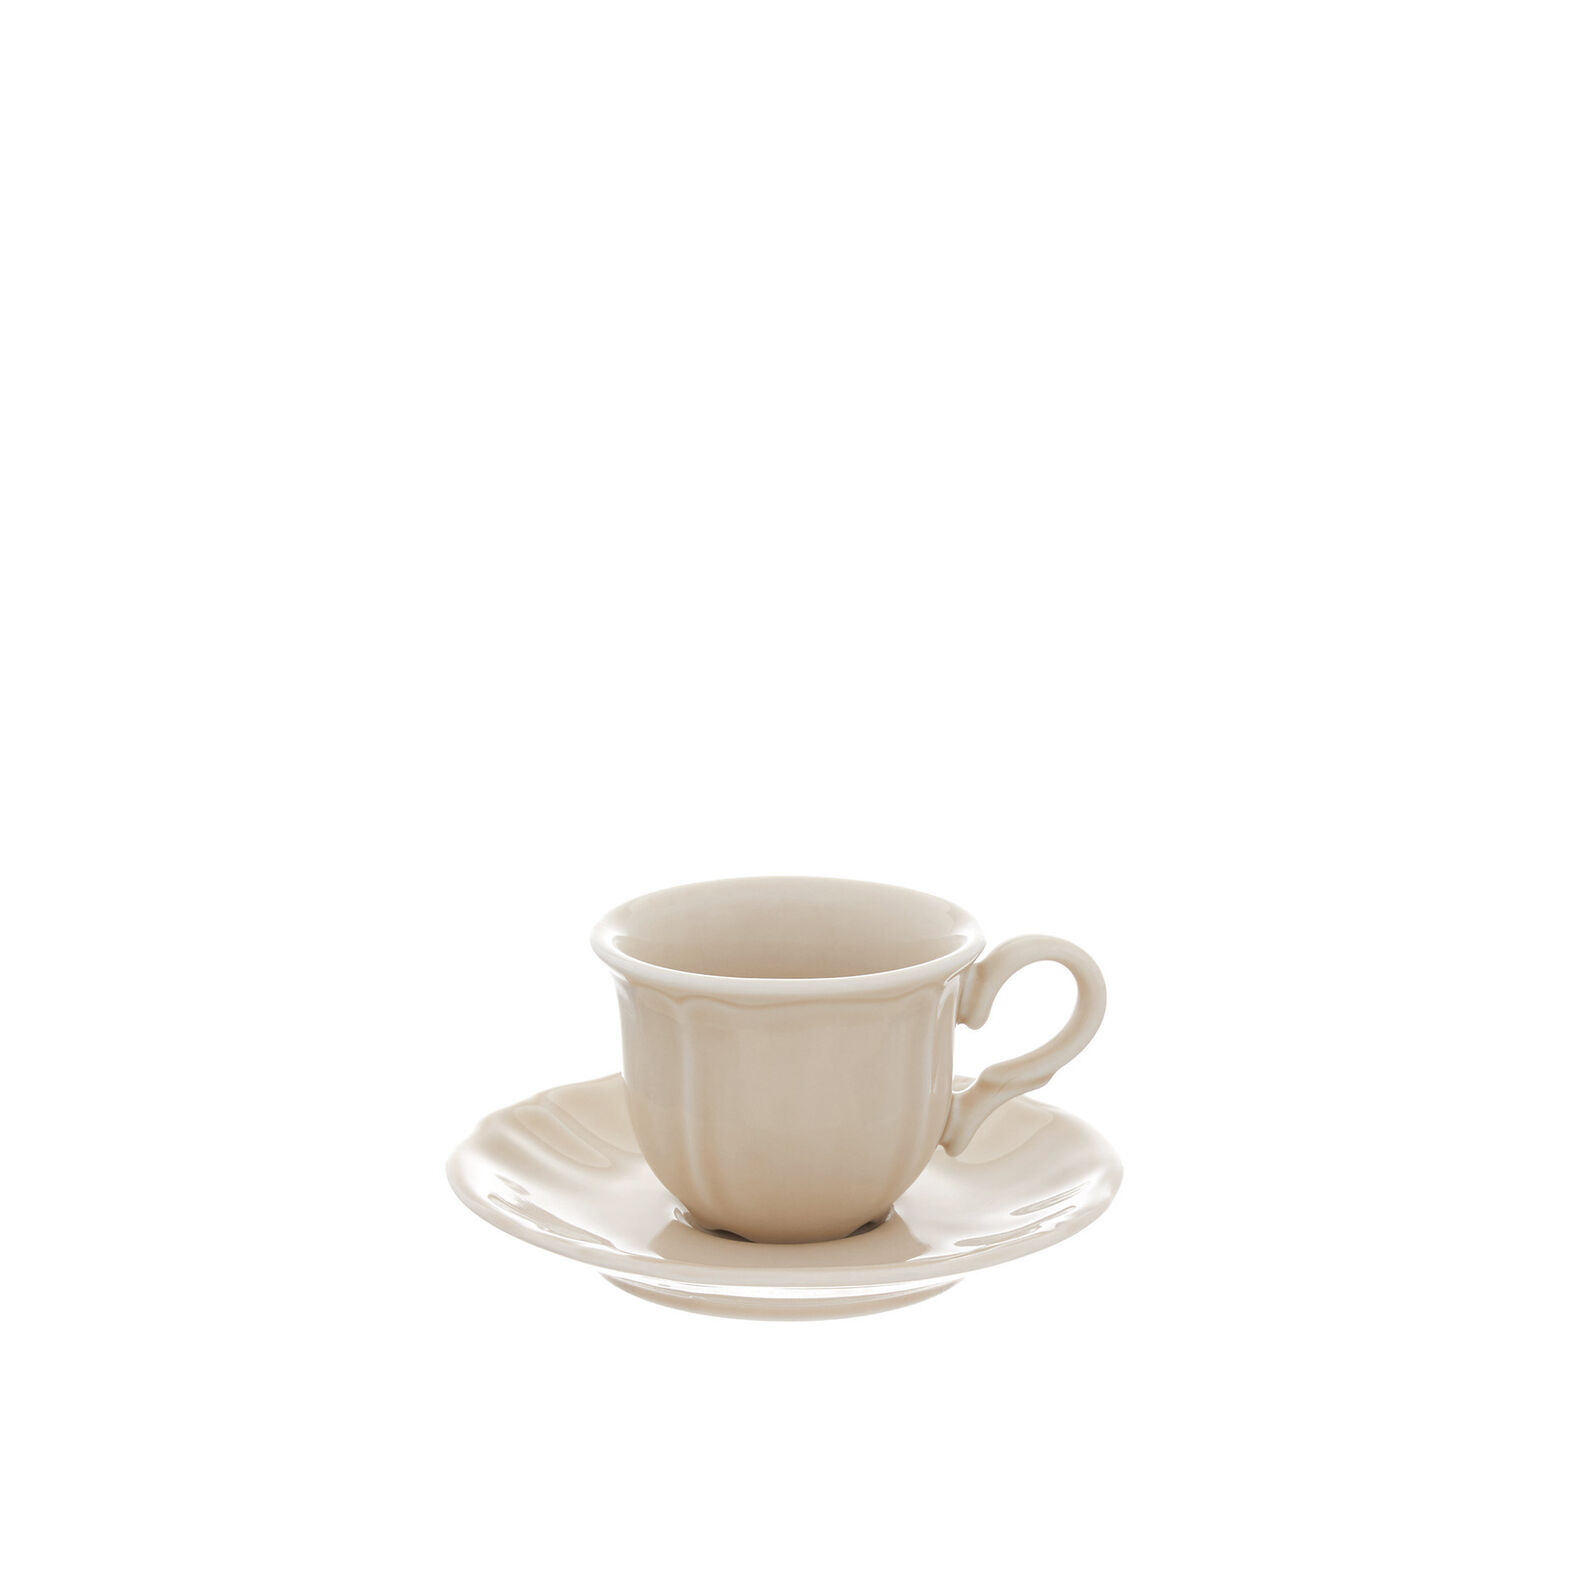 Romantic glazed china coffee cup